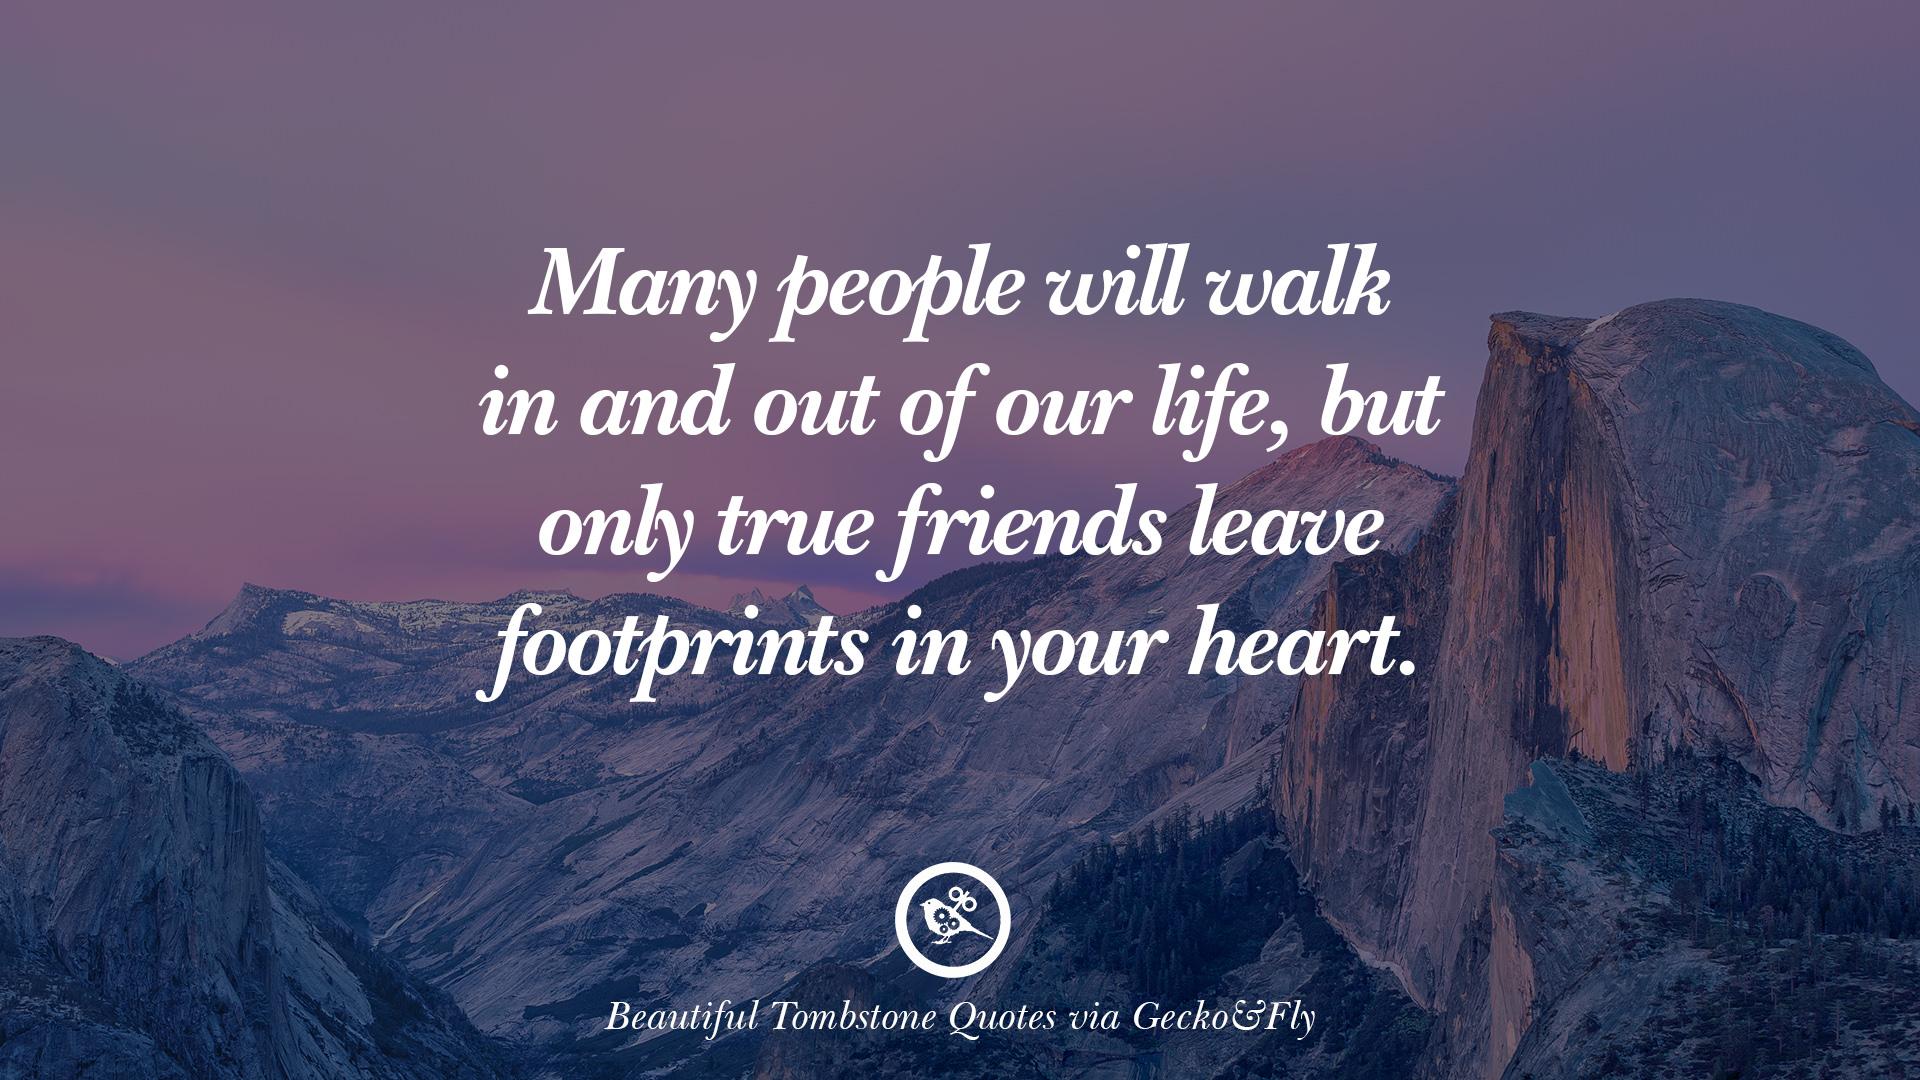 Footprints saying